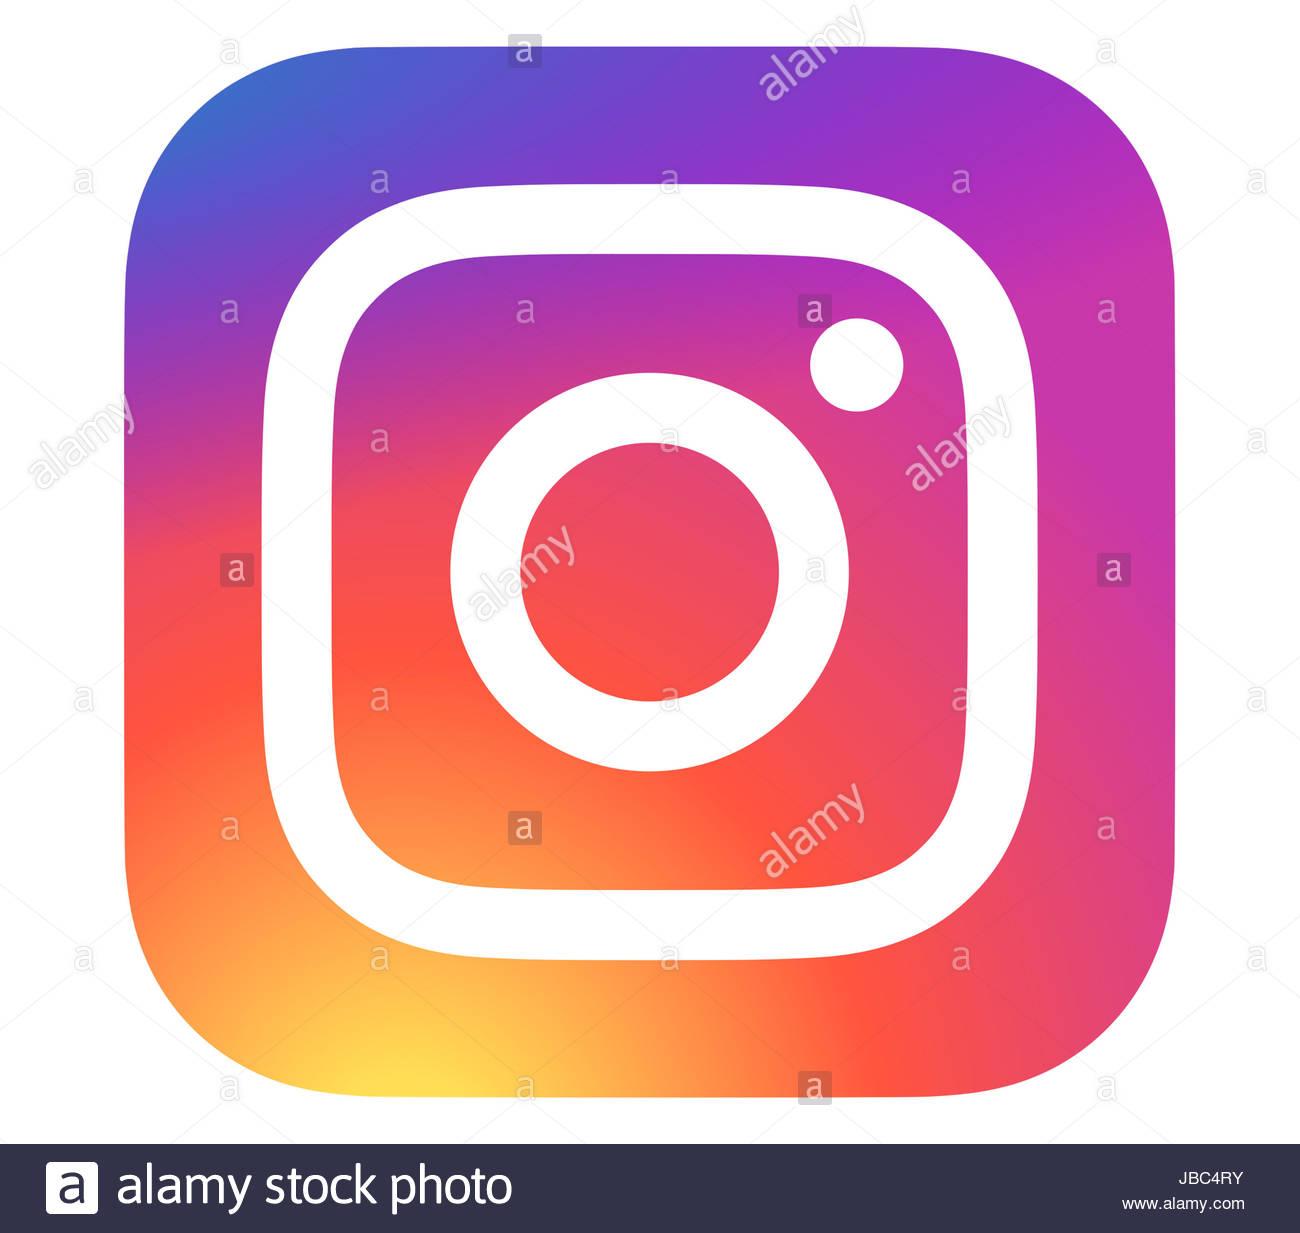 Instagram icon logo - Stock Image